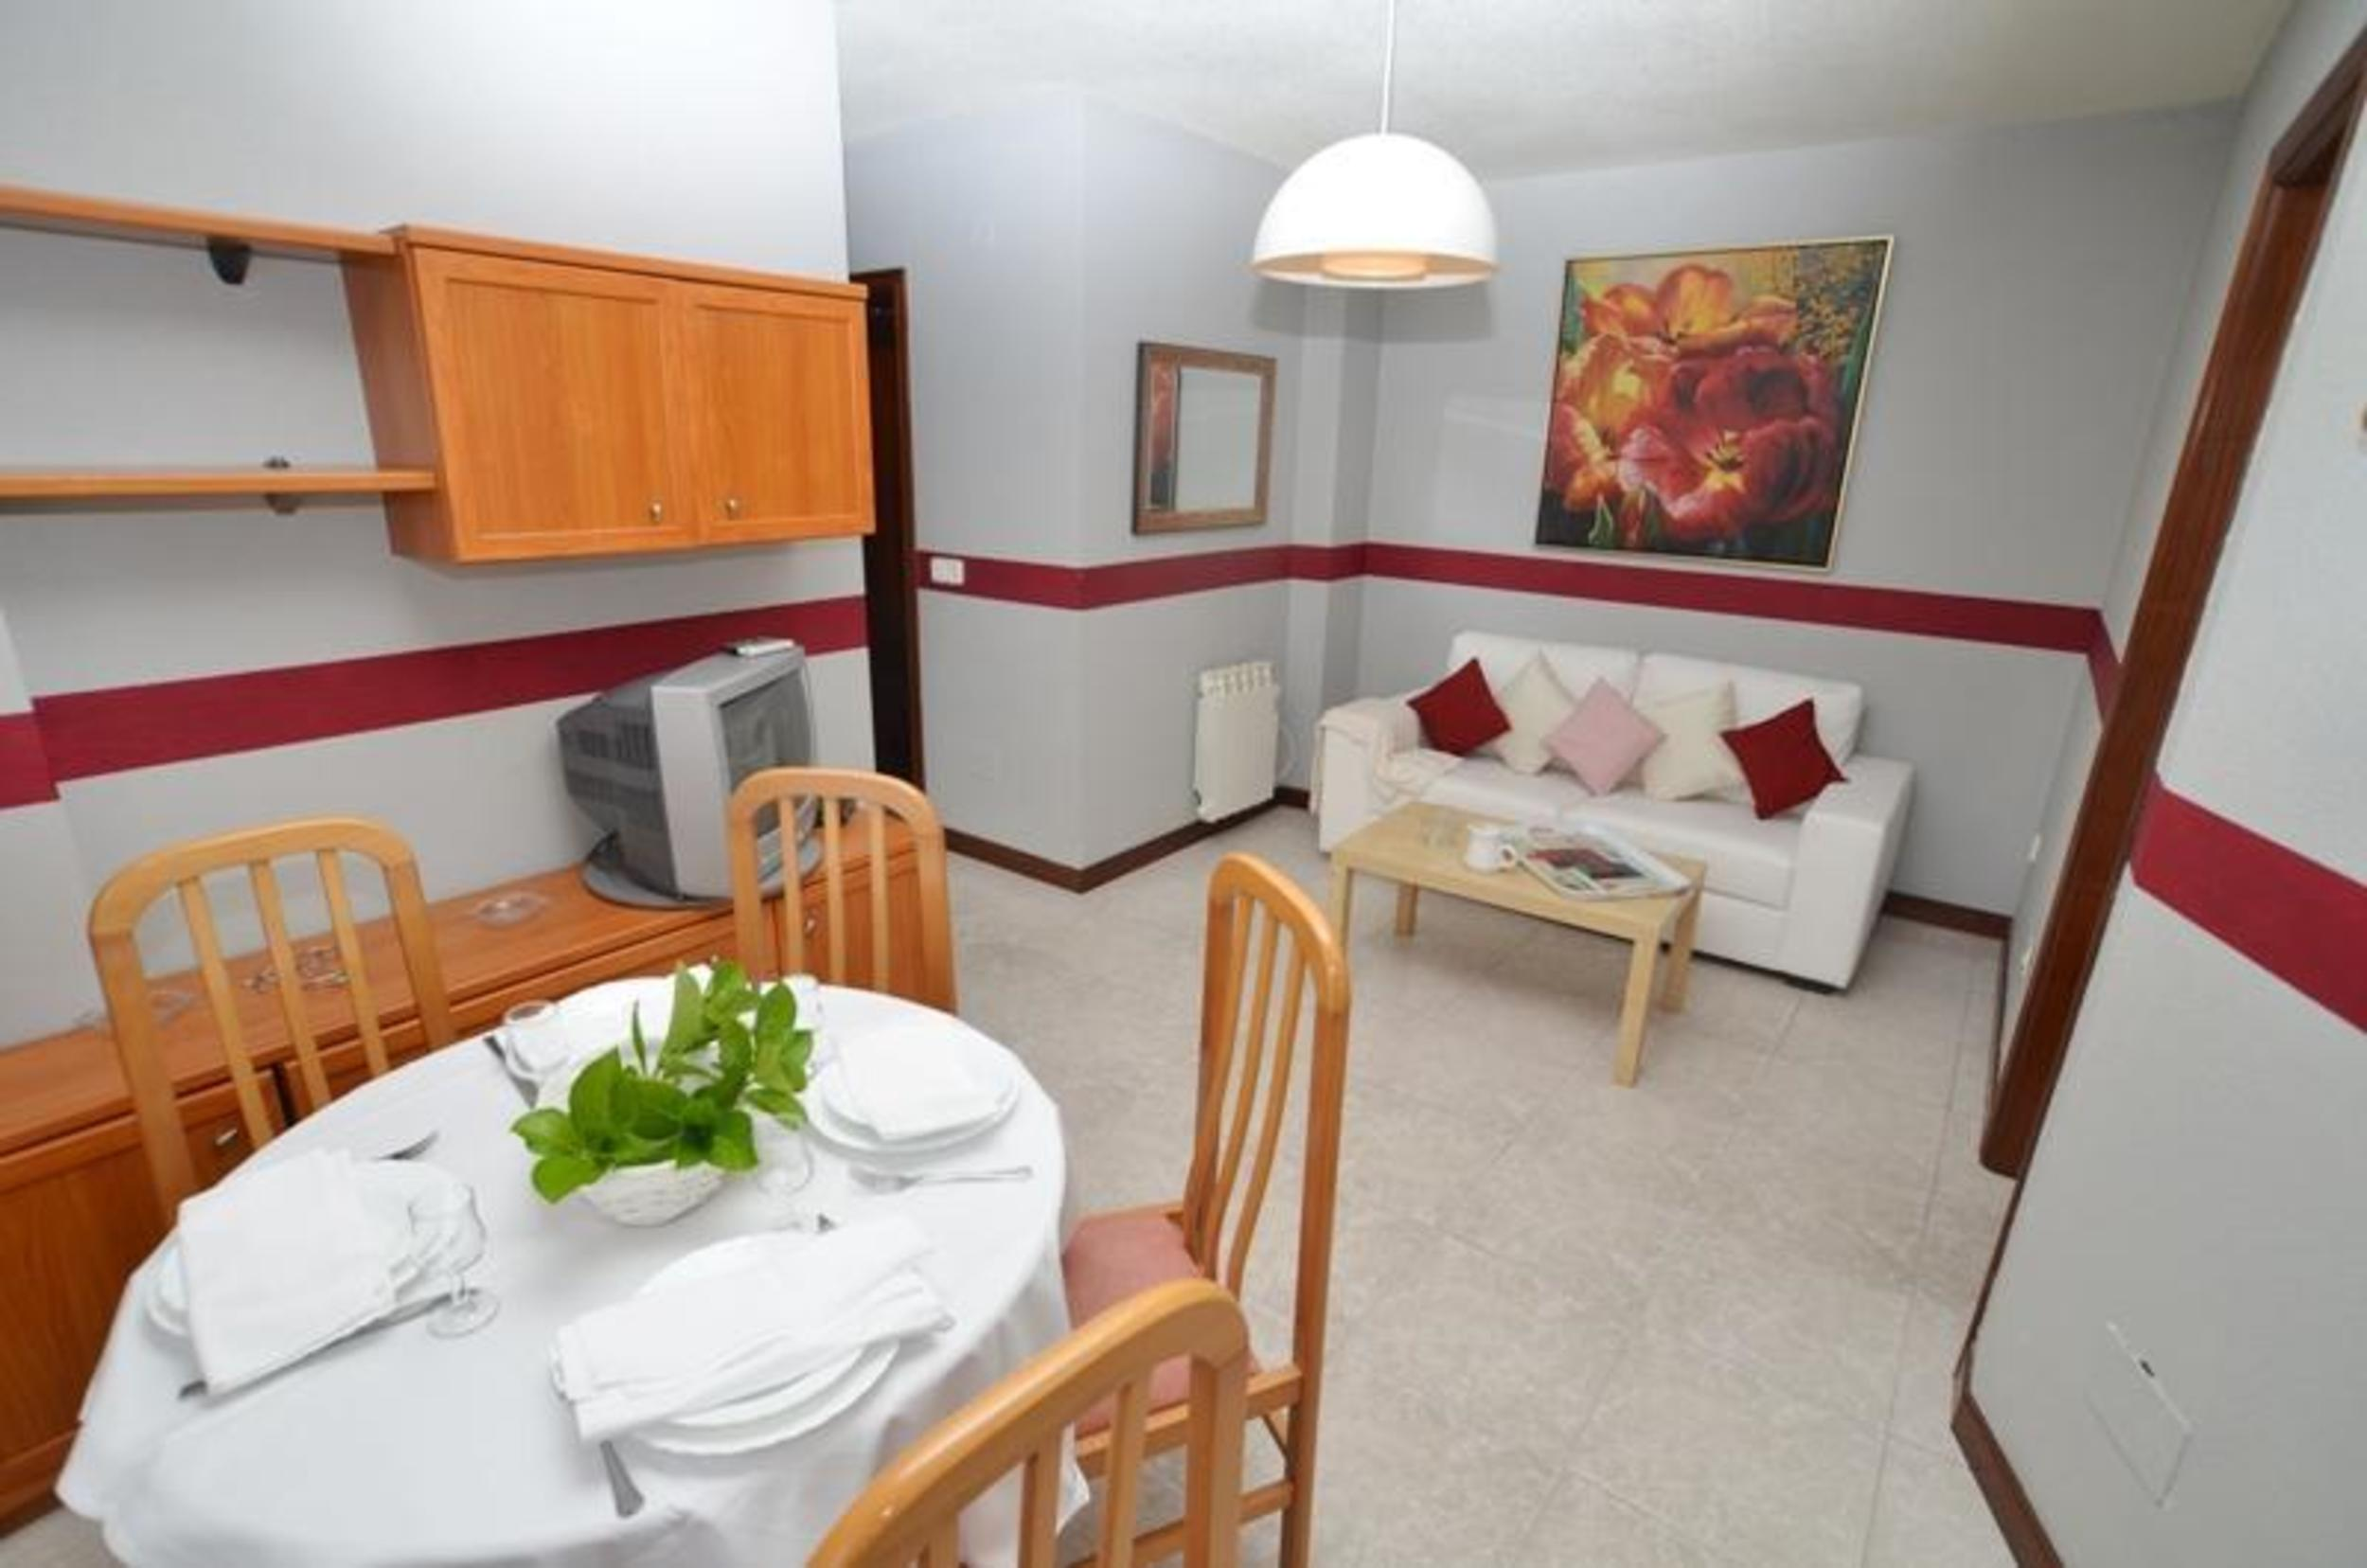 Ferienwohnung Apartment - 2 Bedrooms with Pool and Sea views - 102766 (2360874), Isla, Costa de Cantabria, Kantabrien, Spanien, Bild 1